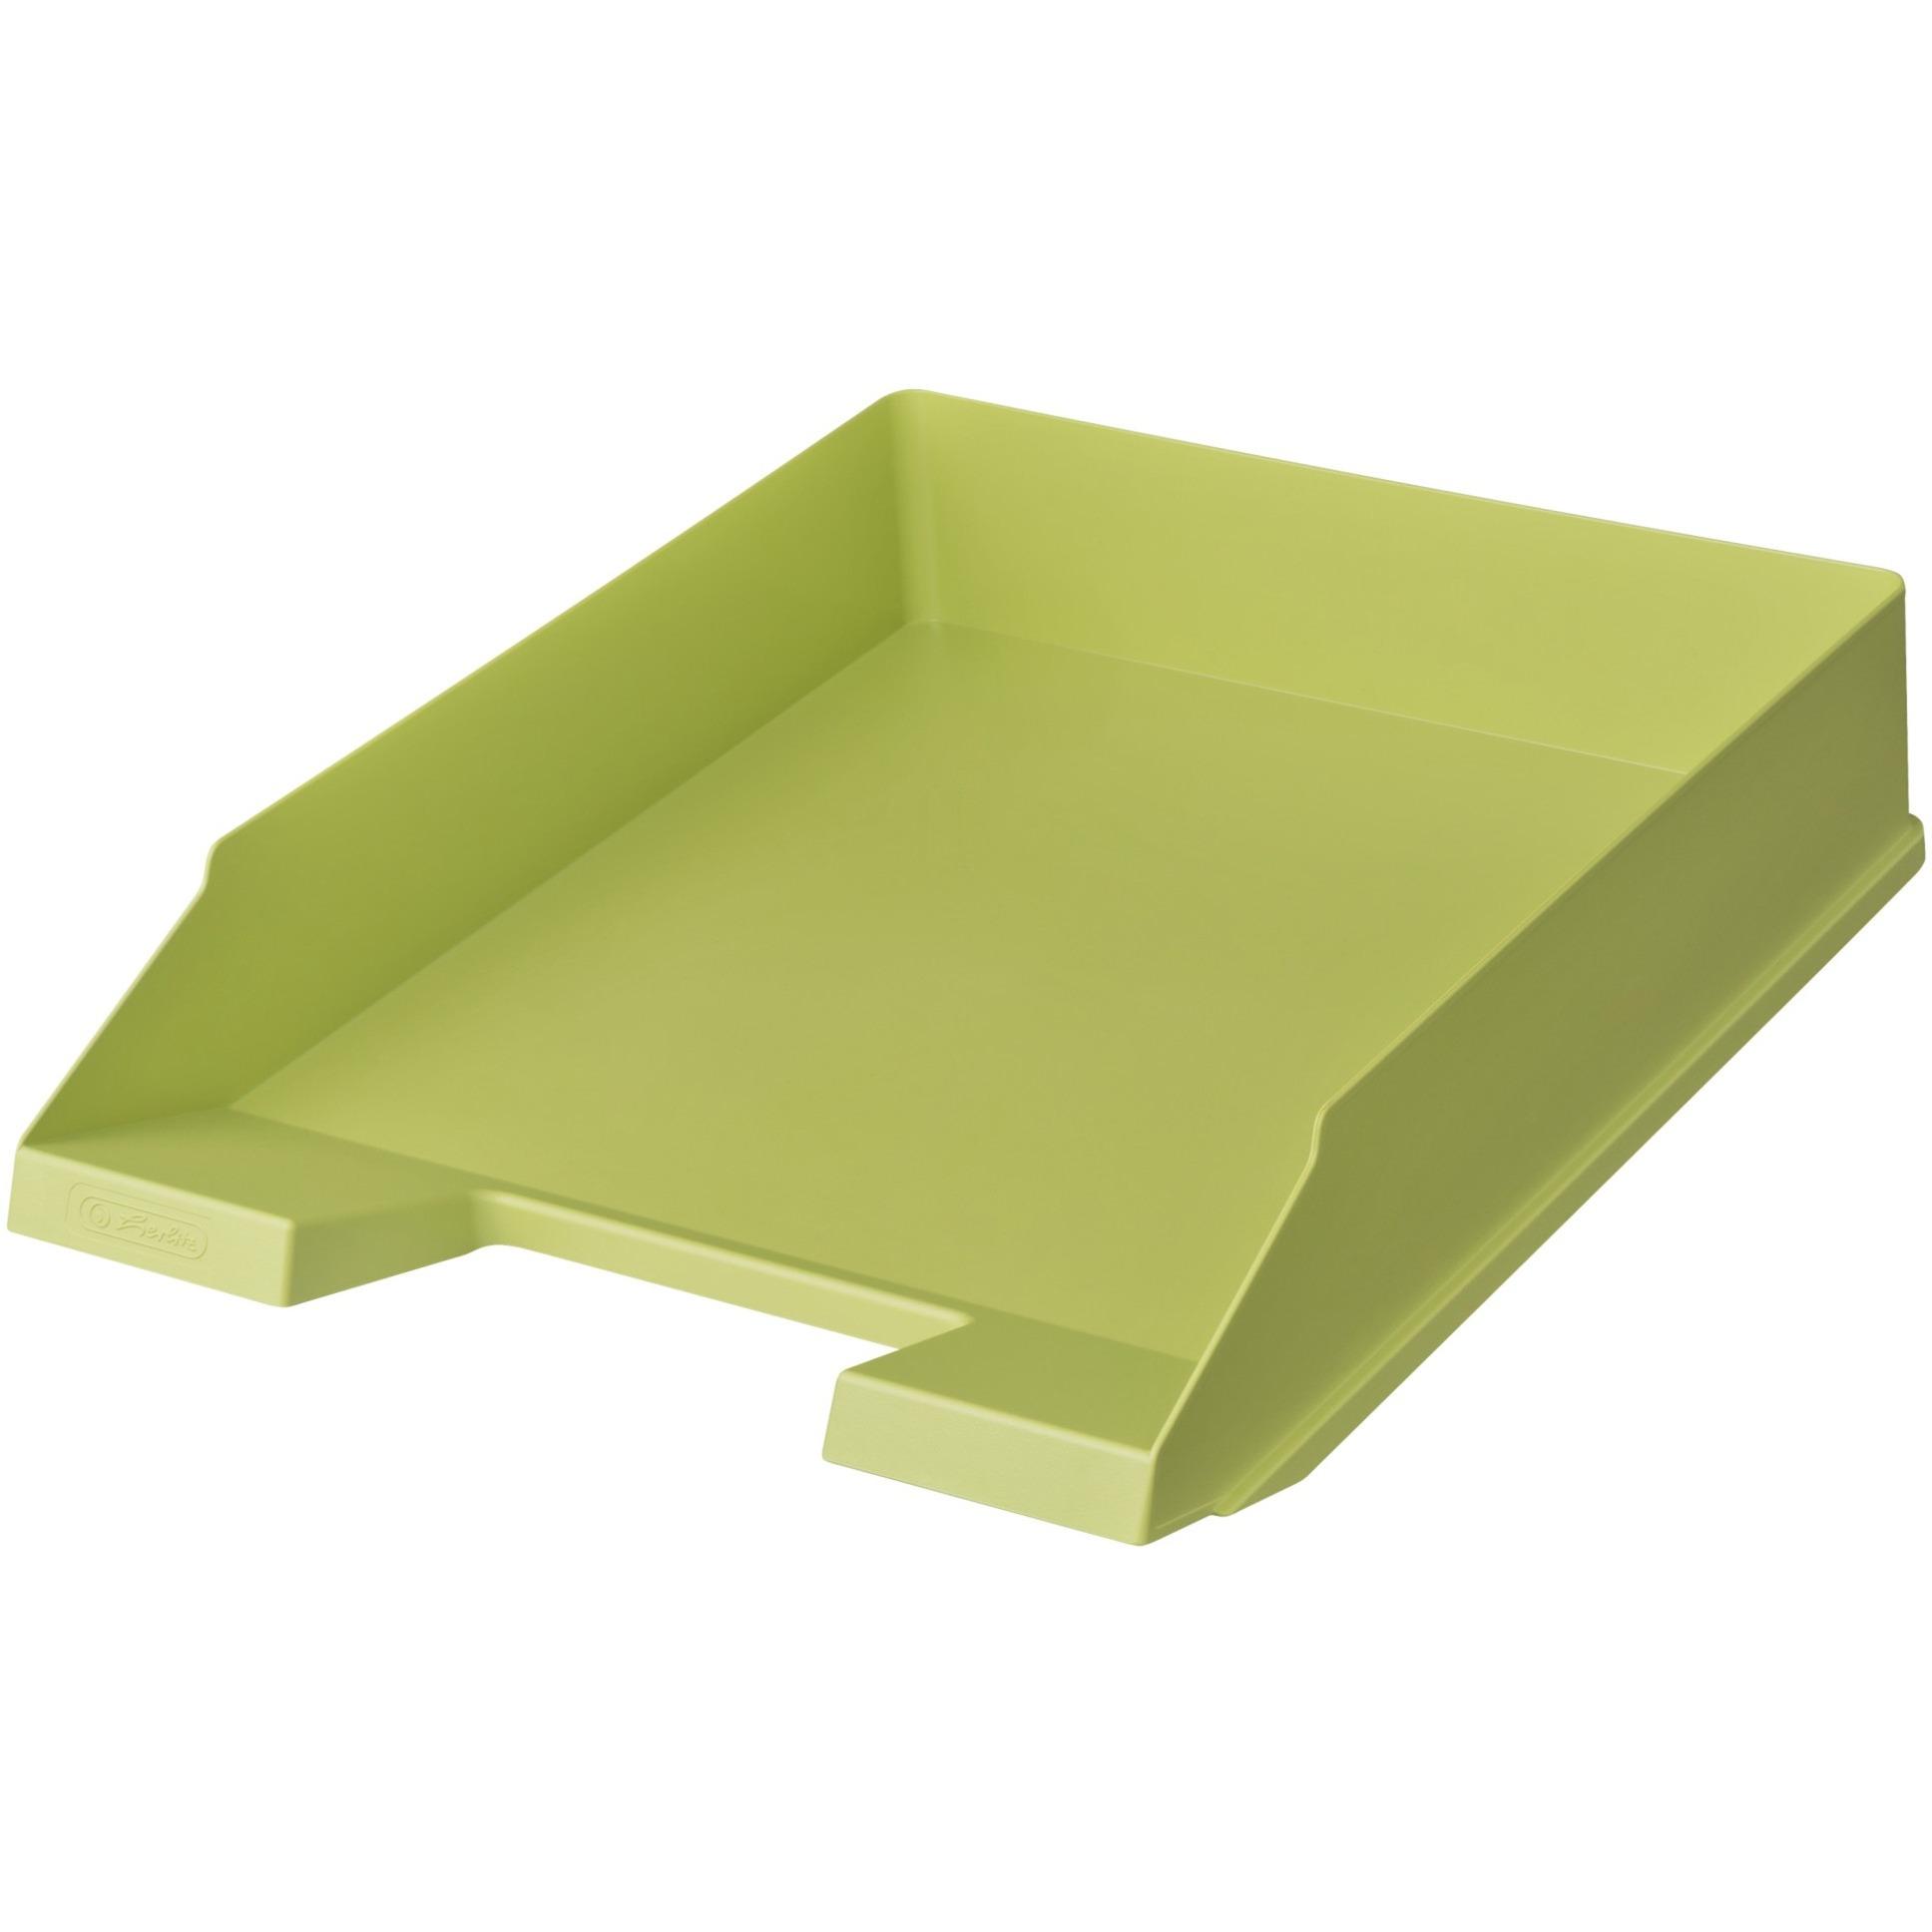 Image of Ablagekorb A4-C4 classic intensiv hellgrün, Briefablage